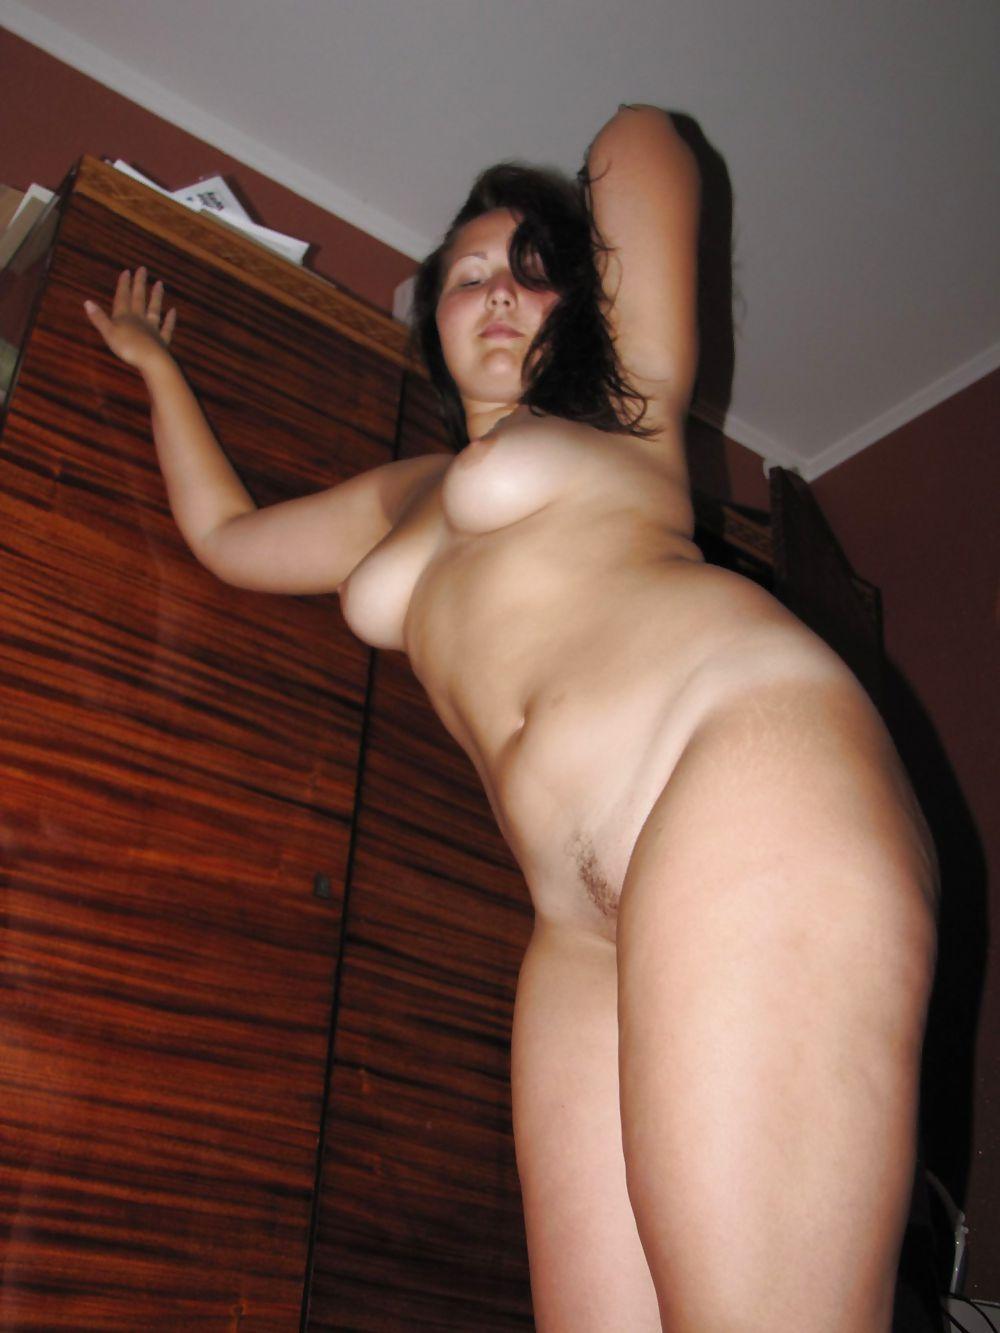 секс фото дома брюнетка в теле знаменитой